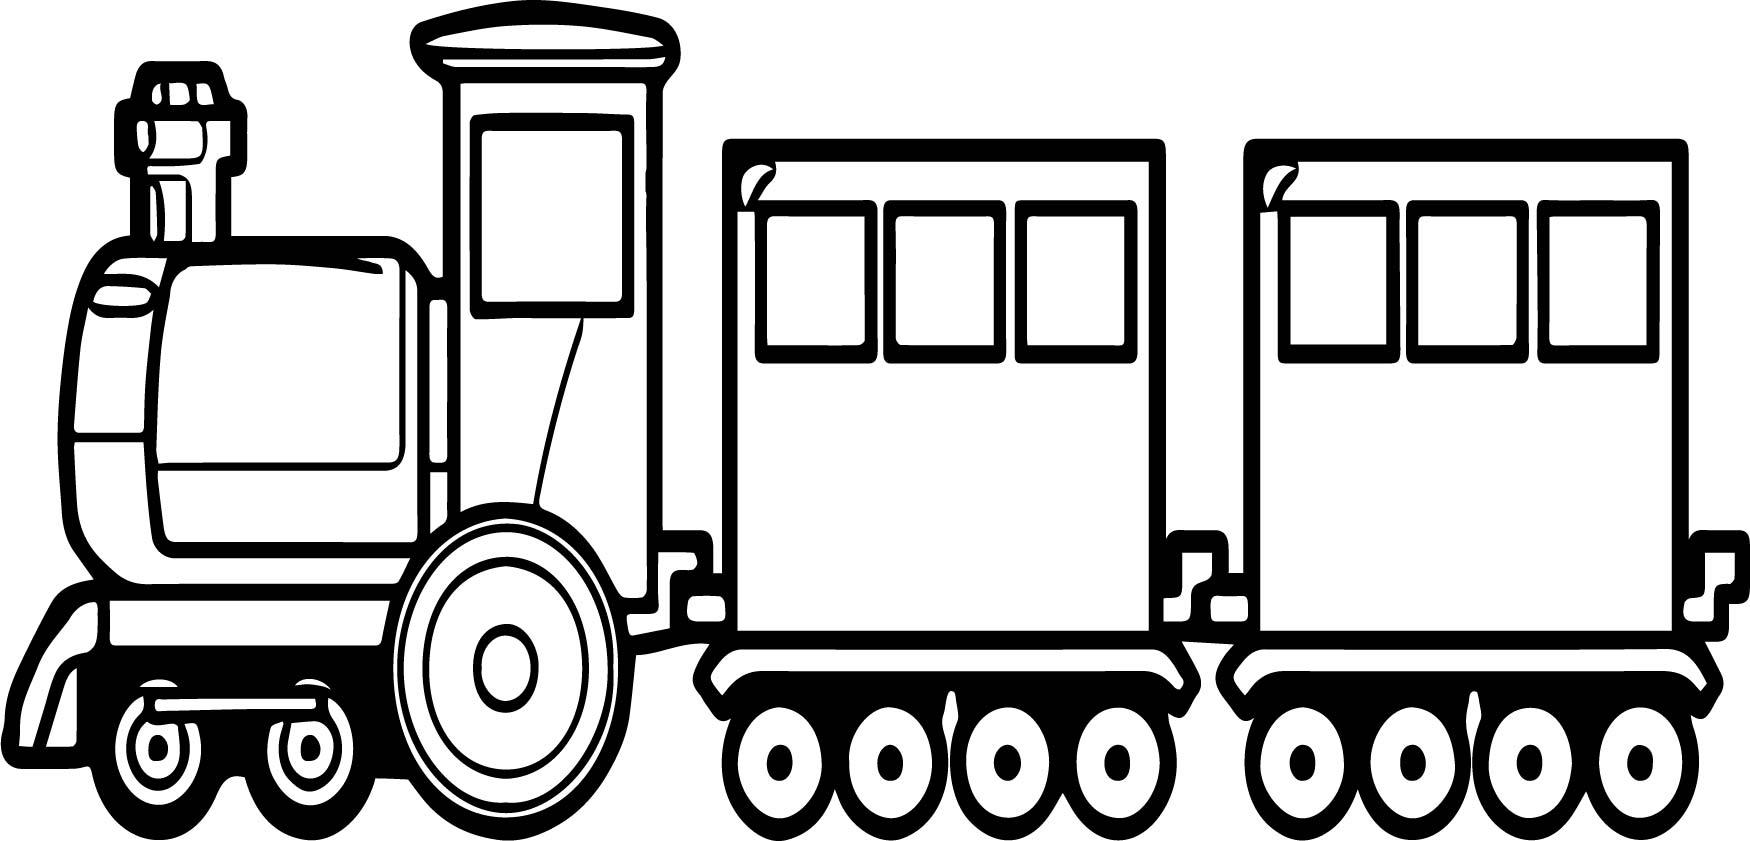 Go Train Coloring Page Wecoloringpage